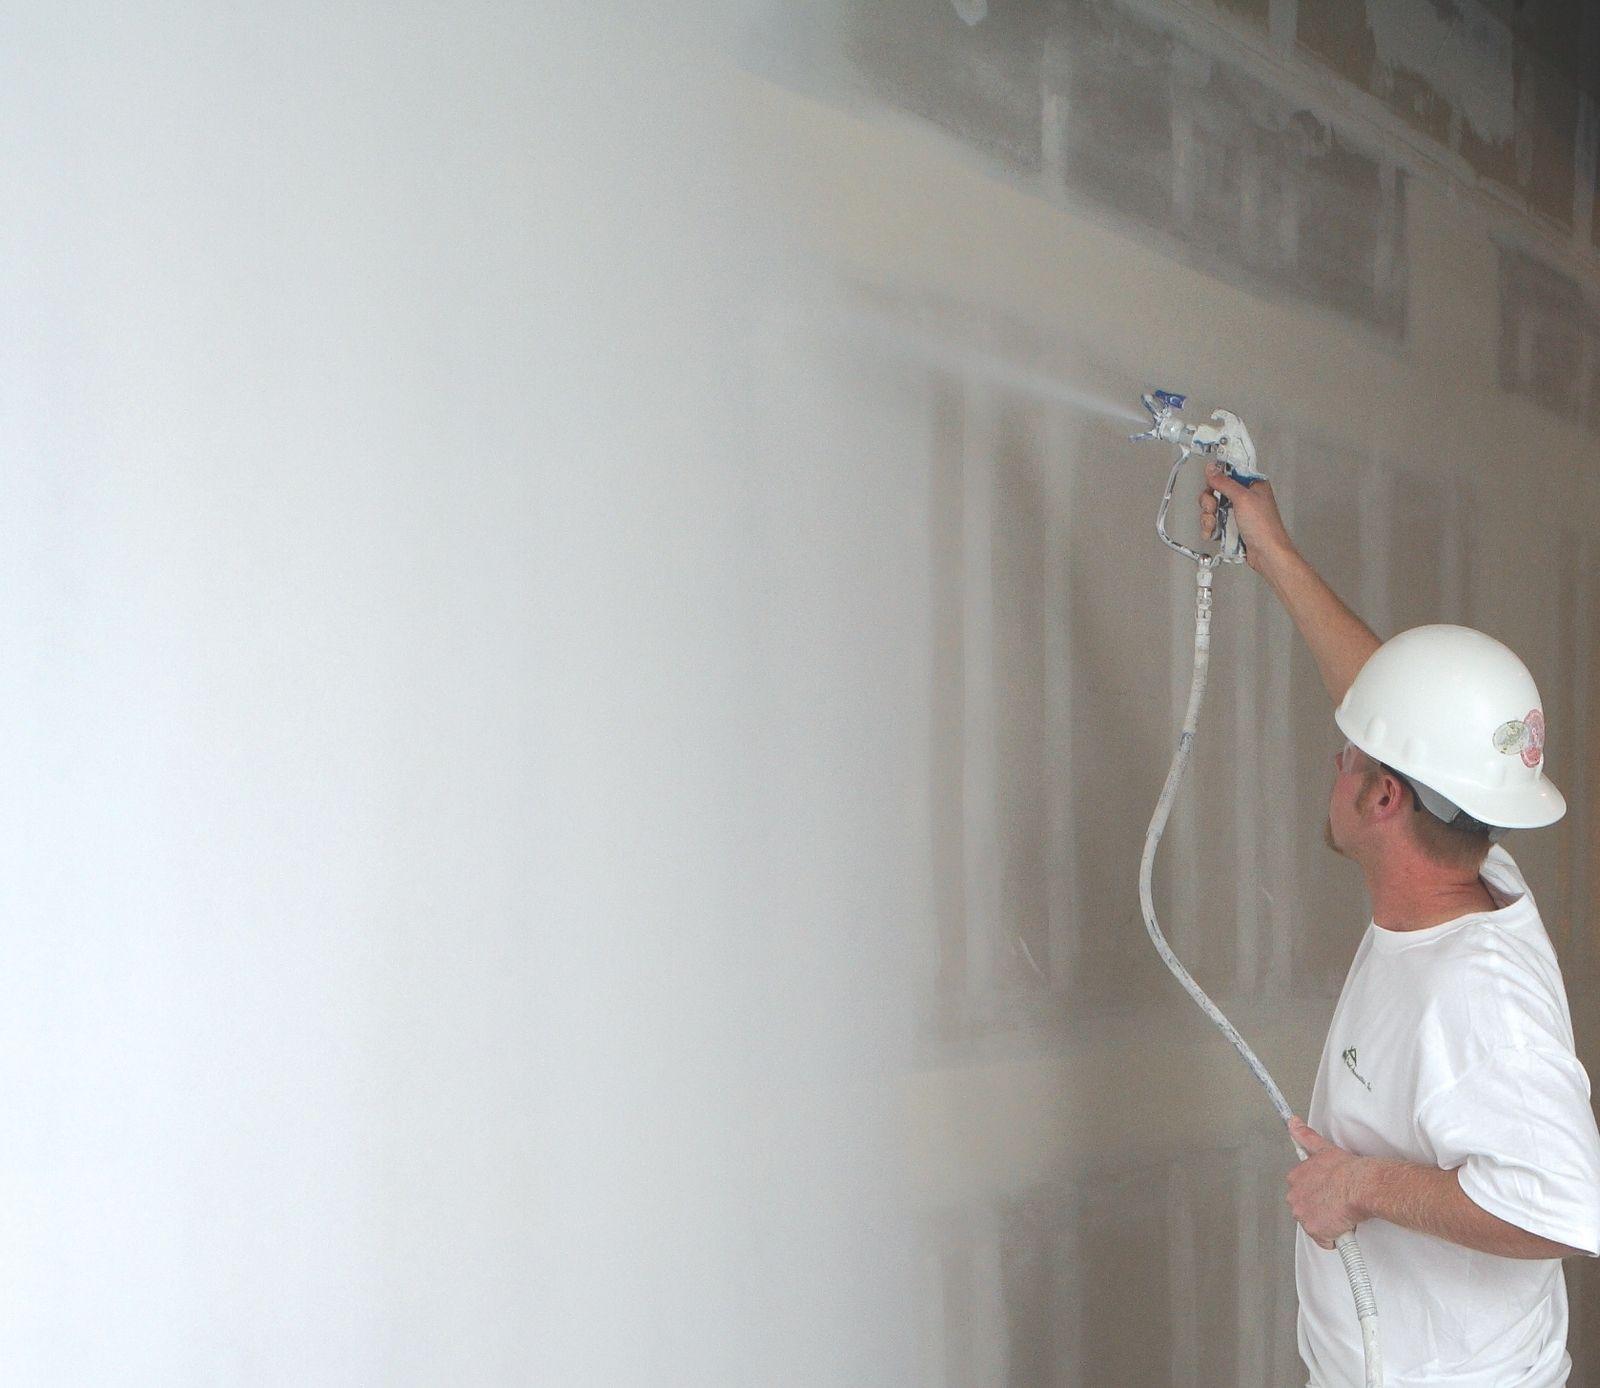 Level 5 Drywall Finishing Skim Coat Sprayers Drywall Finishing Sprayers Texture Sprayer